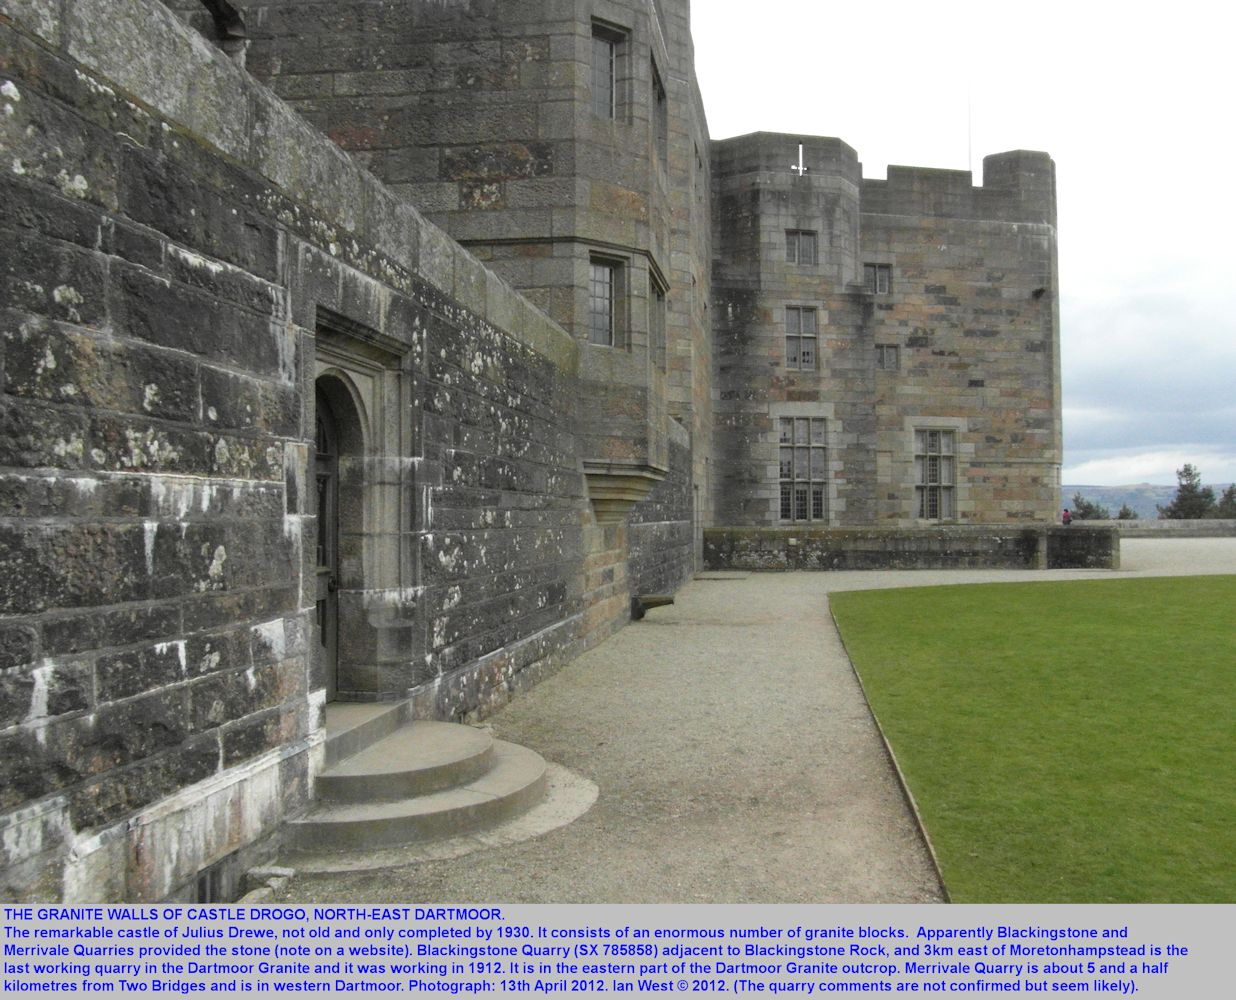 Granite walls of Castle Drogo, eastern Dartmoor, Devon, 13th April 2012